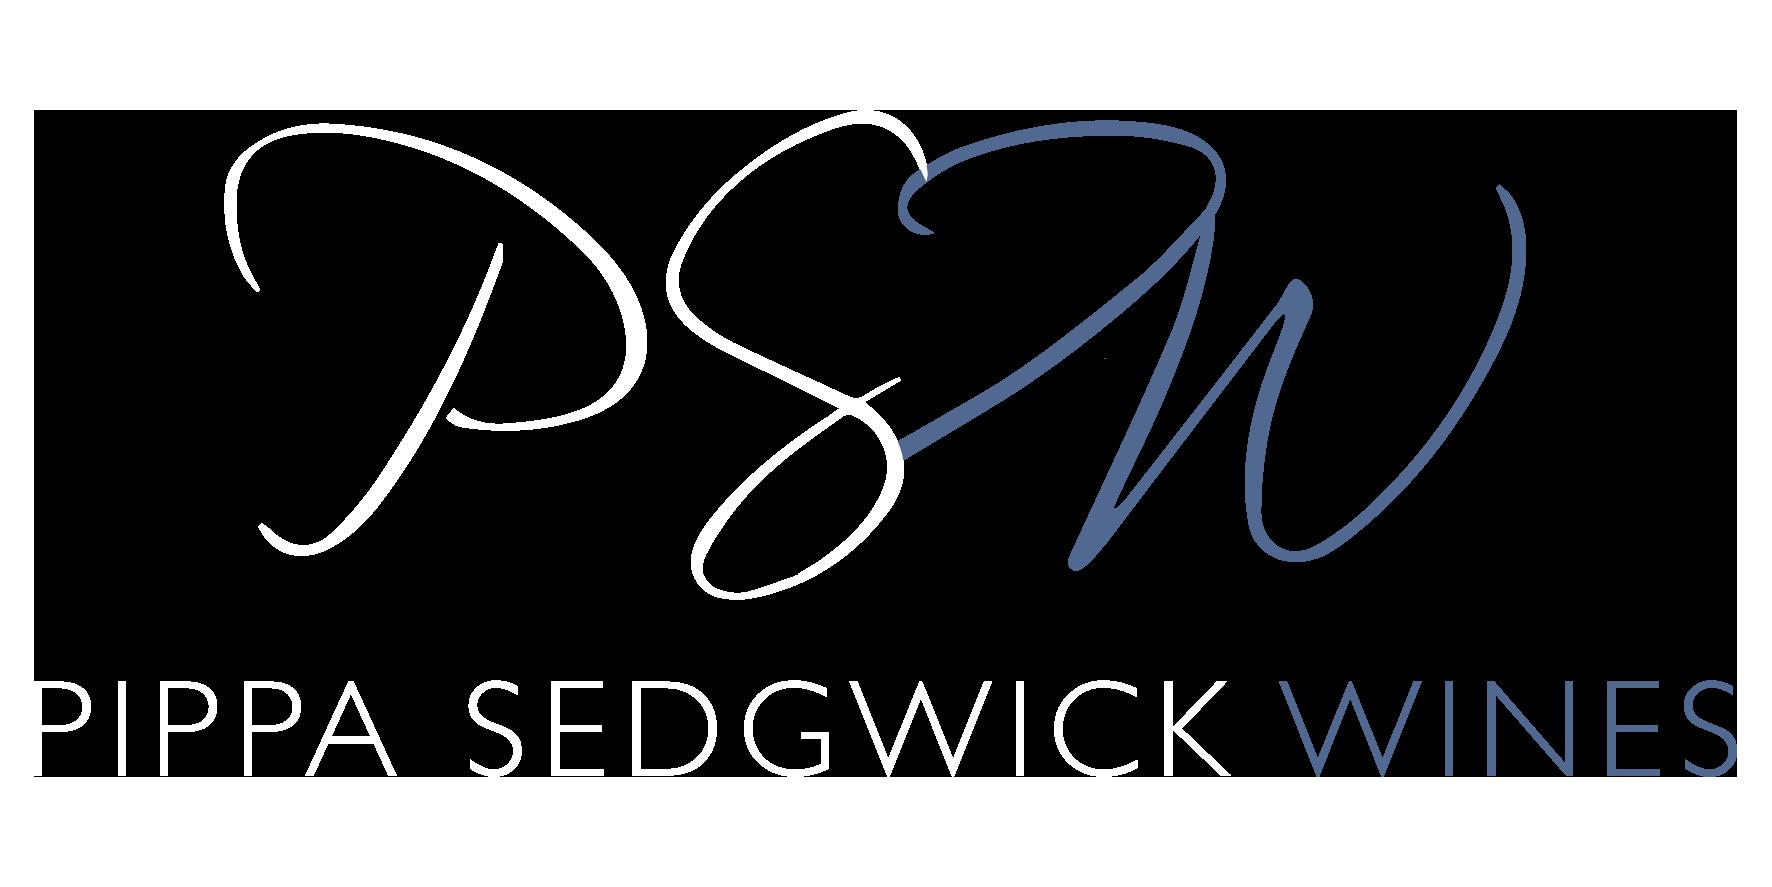 Pippa Sedgwick Wines